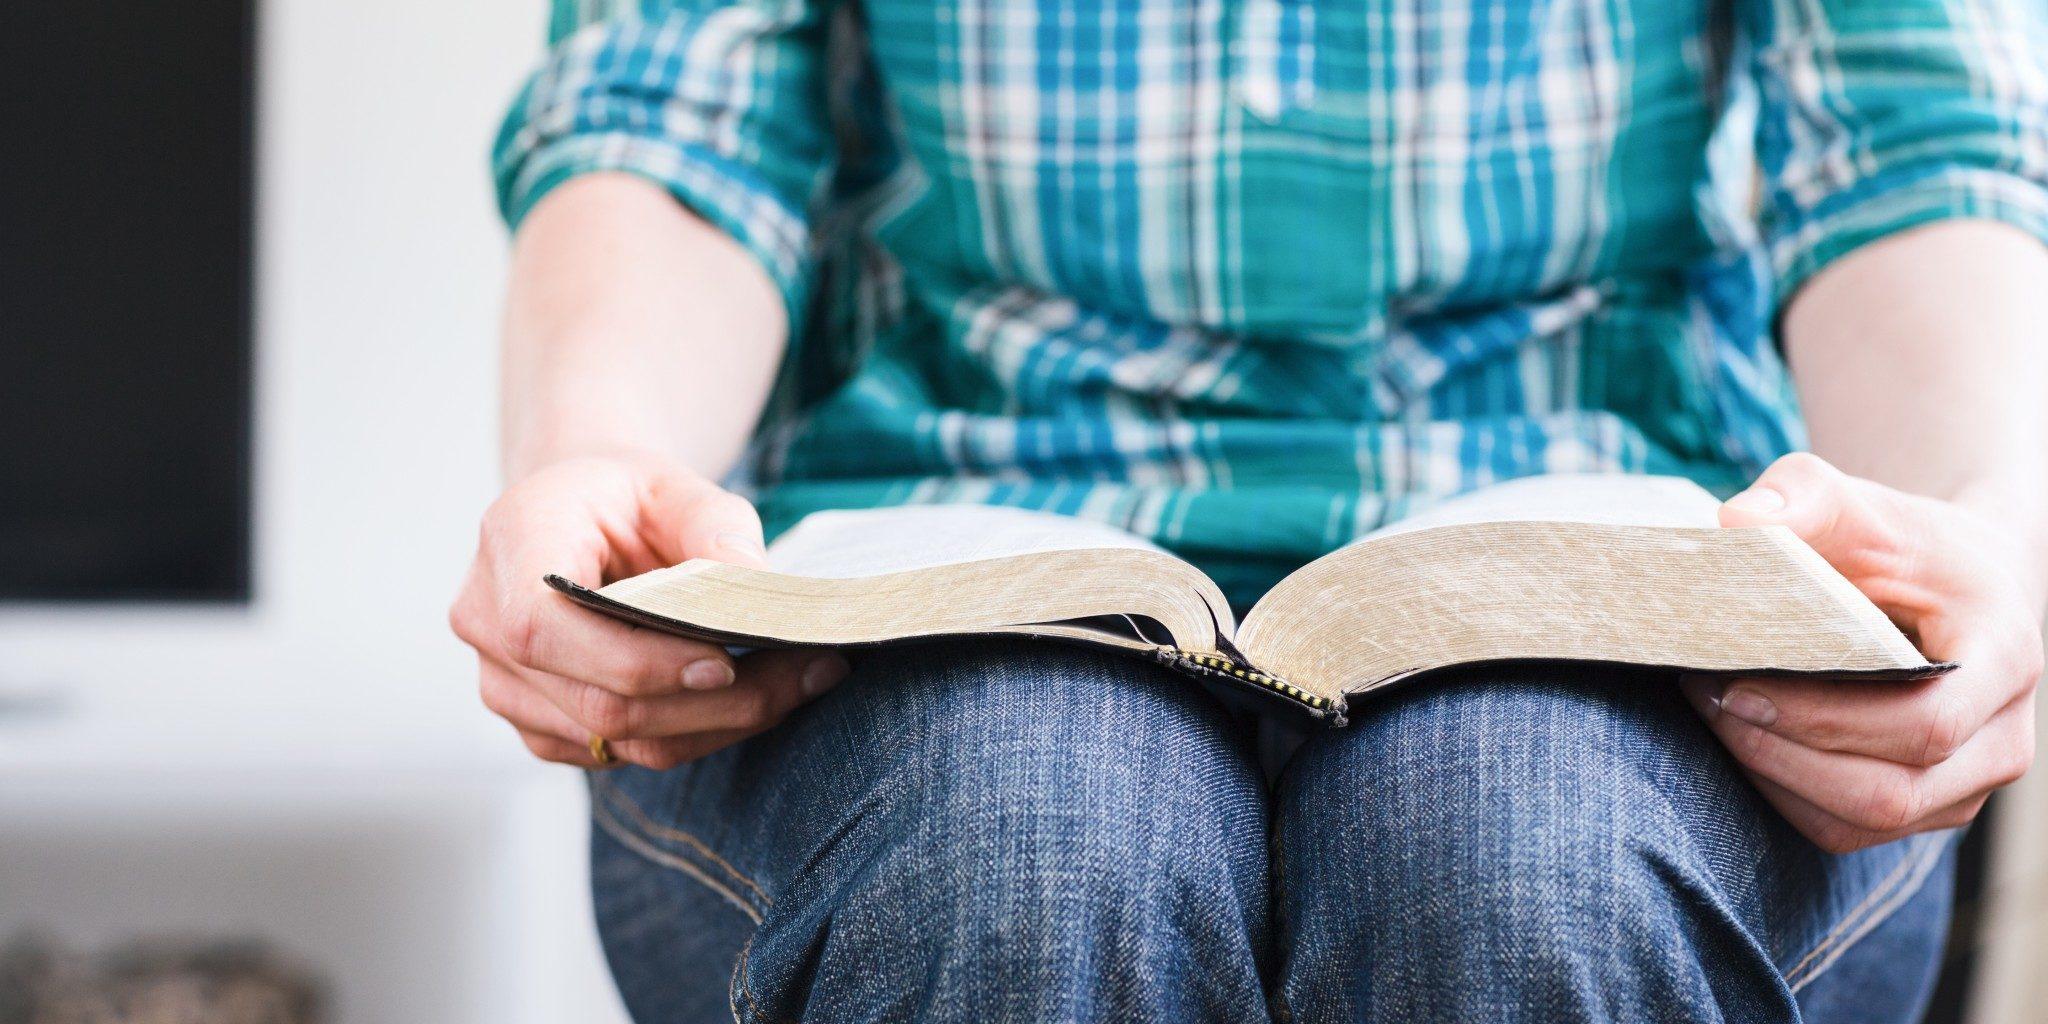 bigstock-Bible-Study-At-Home-92486009